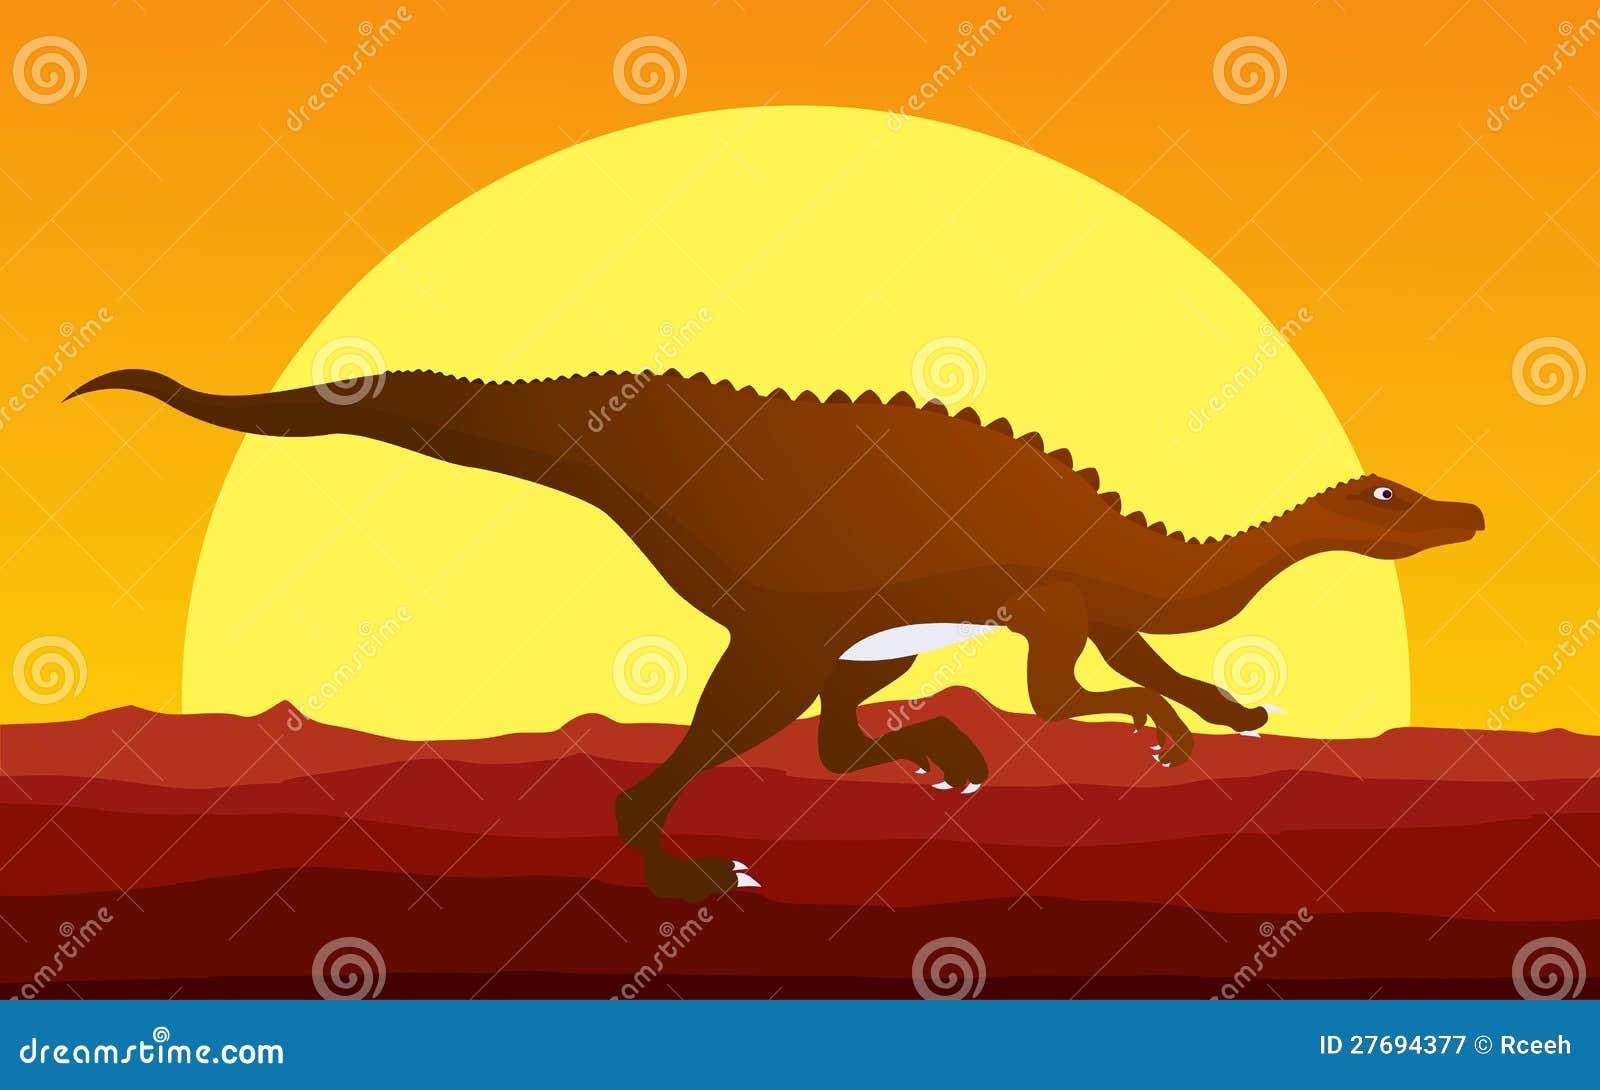 running with dinosaur wallpaper - photo #32